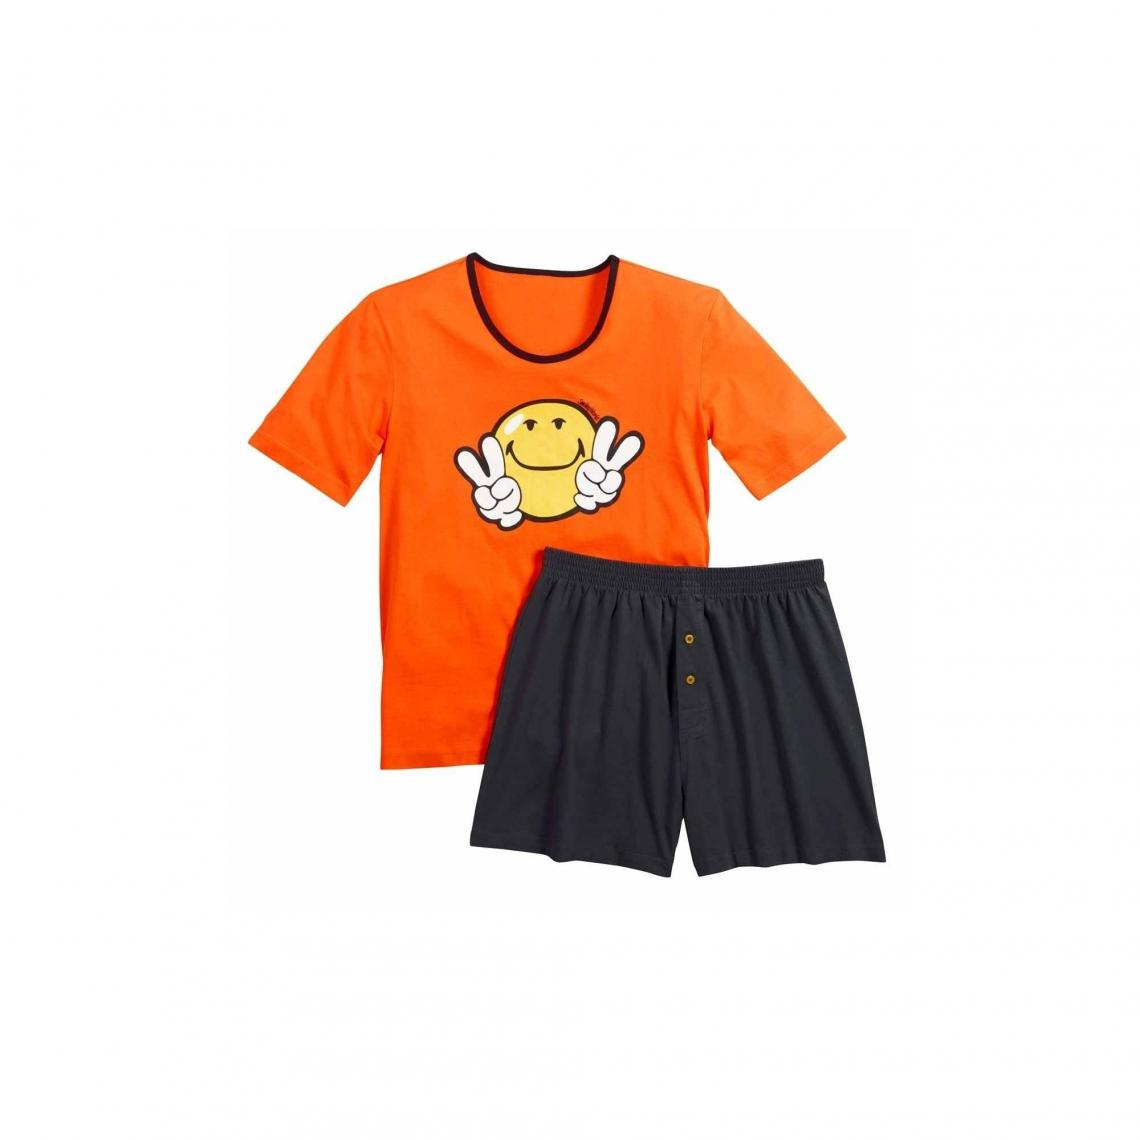 Pyjama court  Night by Smiley POMM'POIRE - Orange - 3Suisses